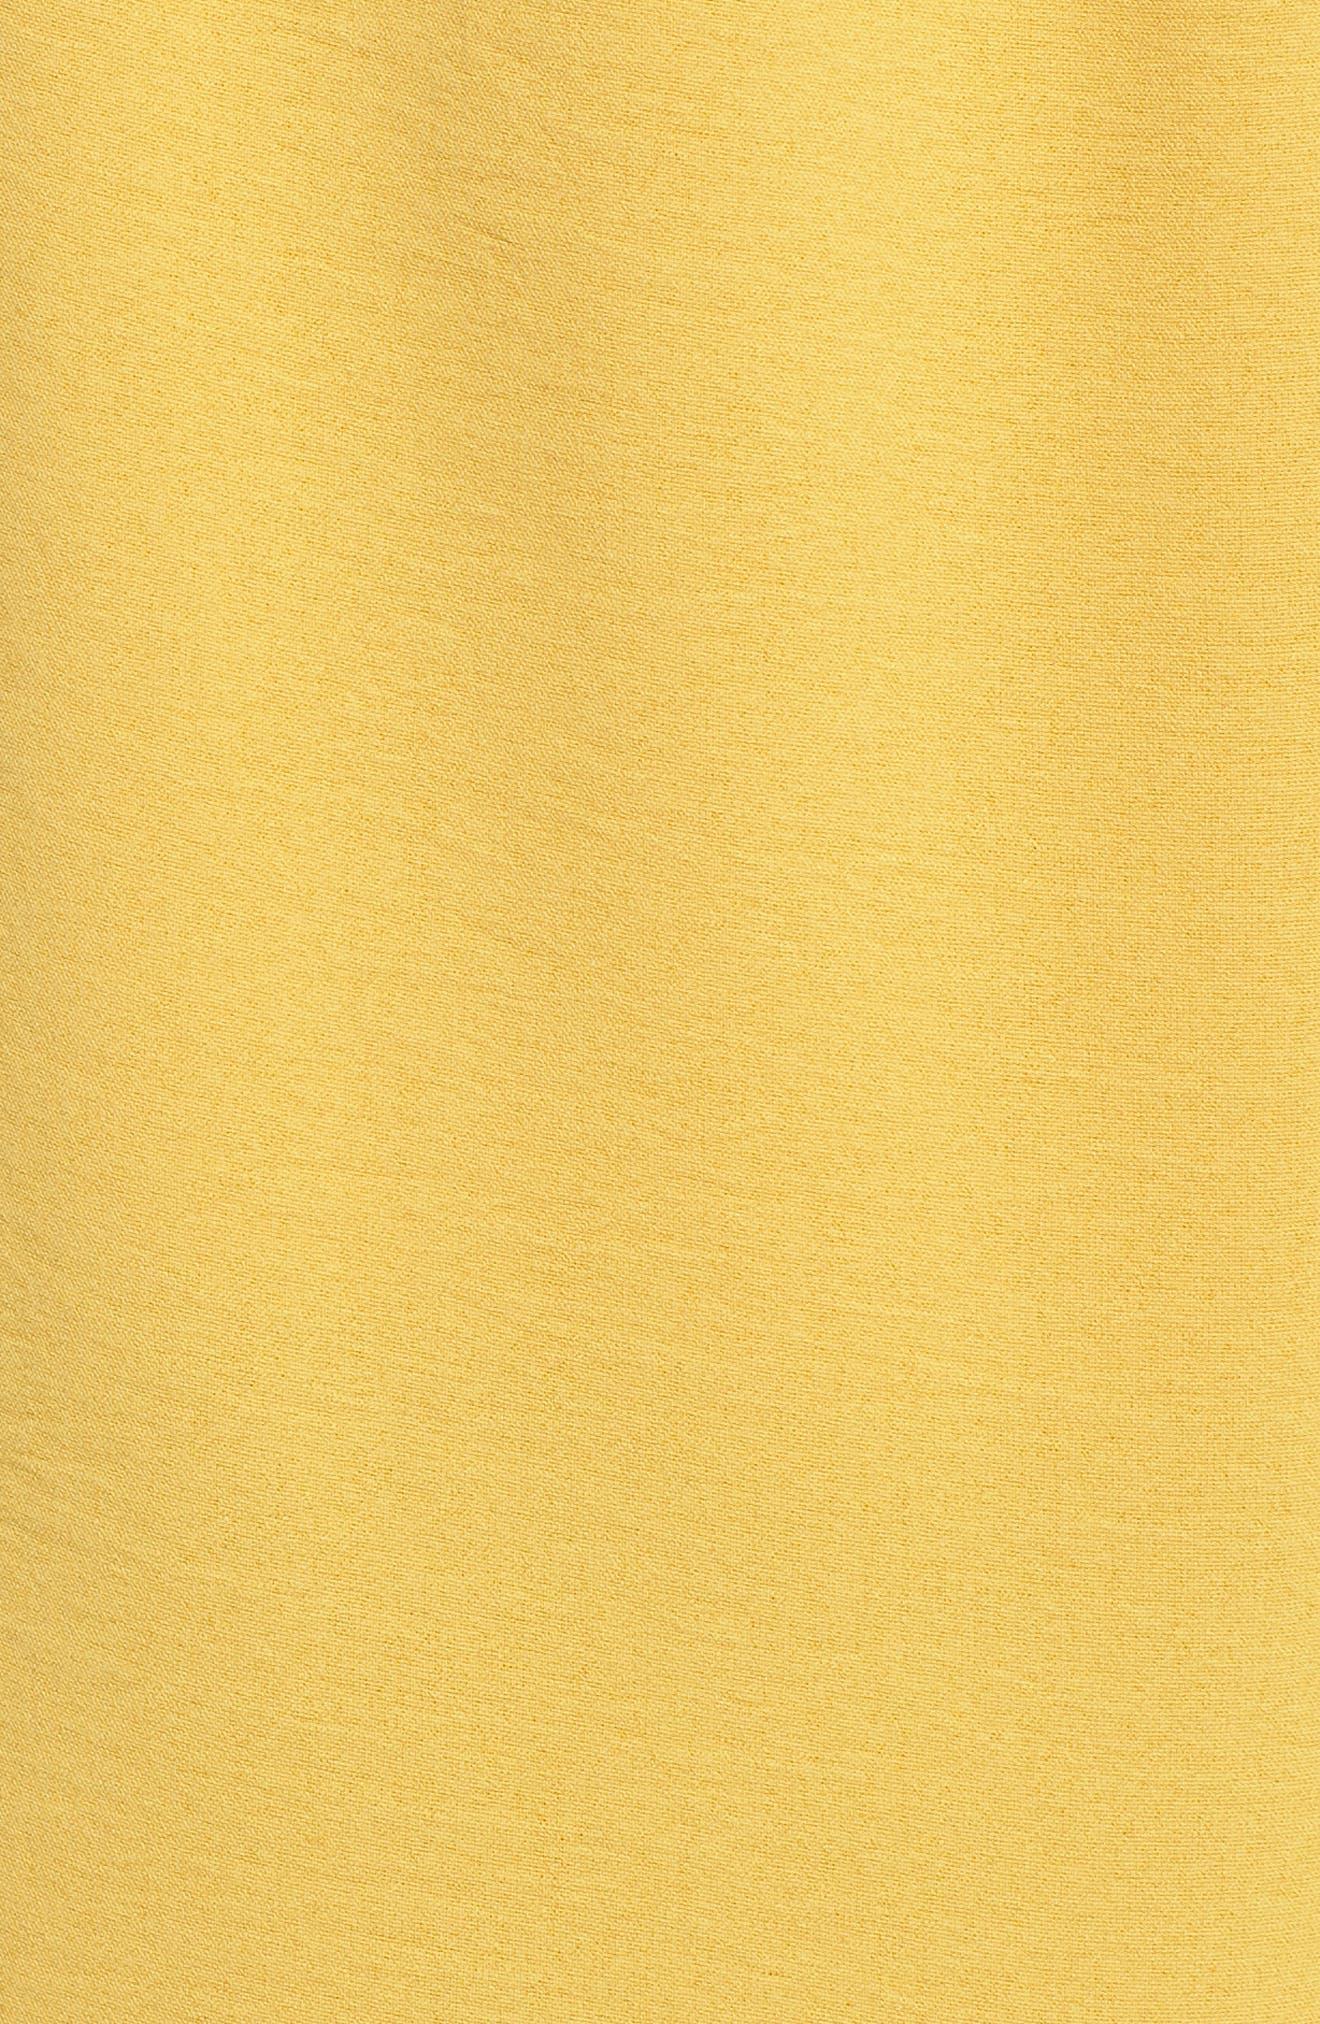 Chriselle x J.O.A. Pleat High Waist Crop Wide Leg Pants,                             Alternate thumbnail 7, color,                             Roman Gold